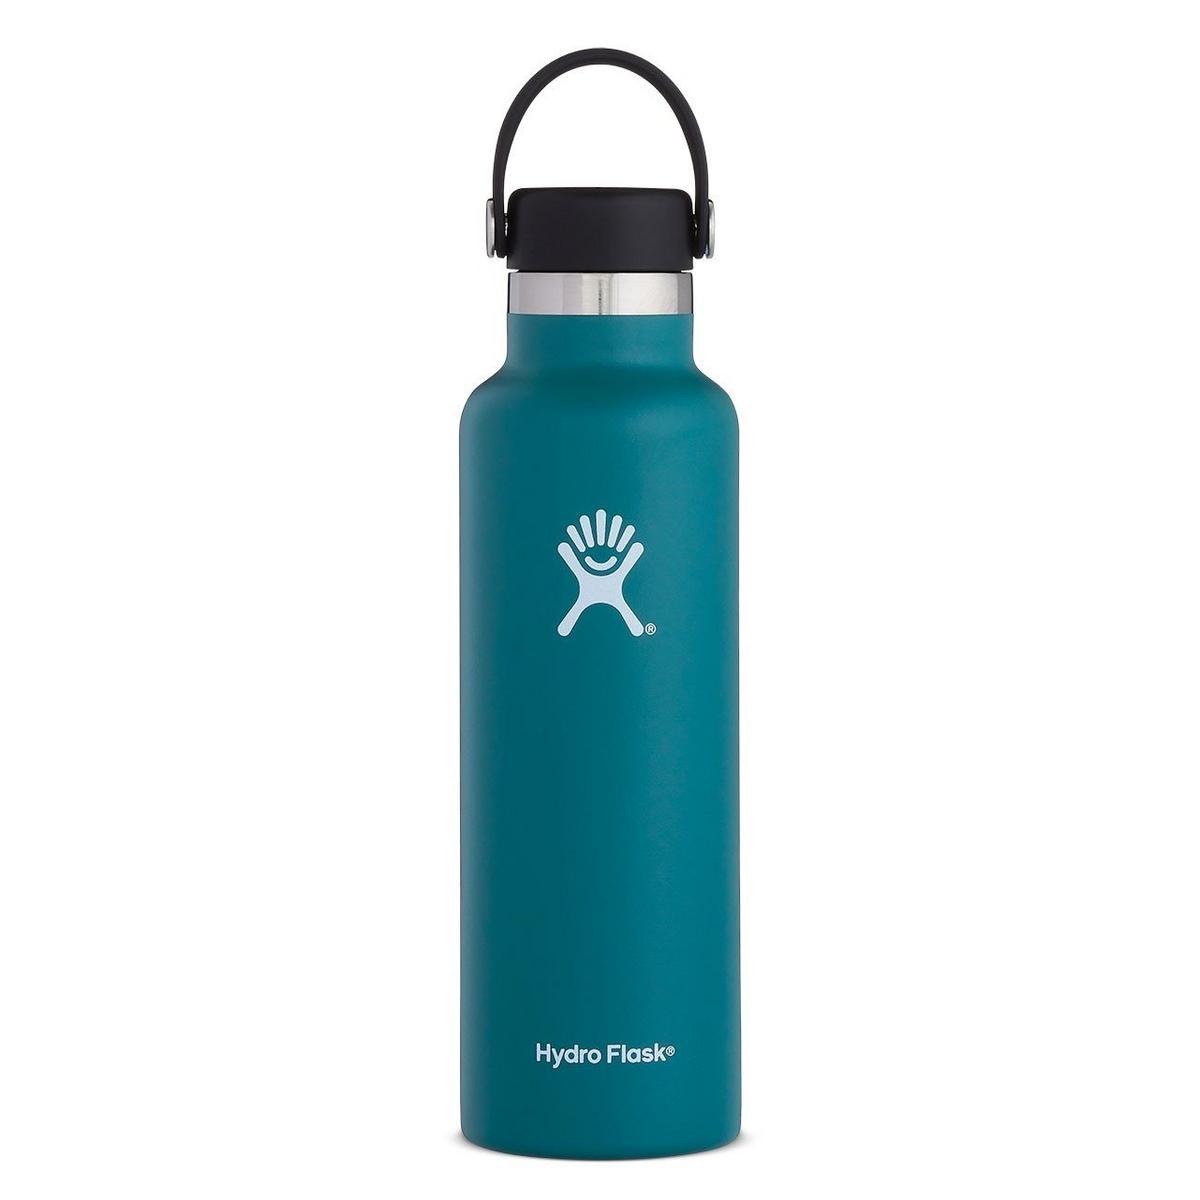 Hydro Flask 21oz Flex Standard Mouth